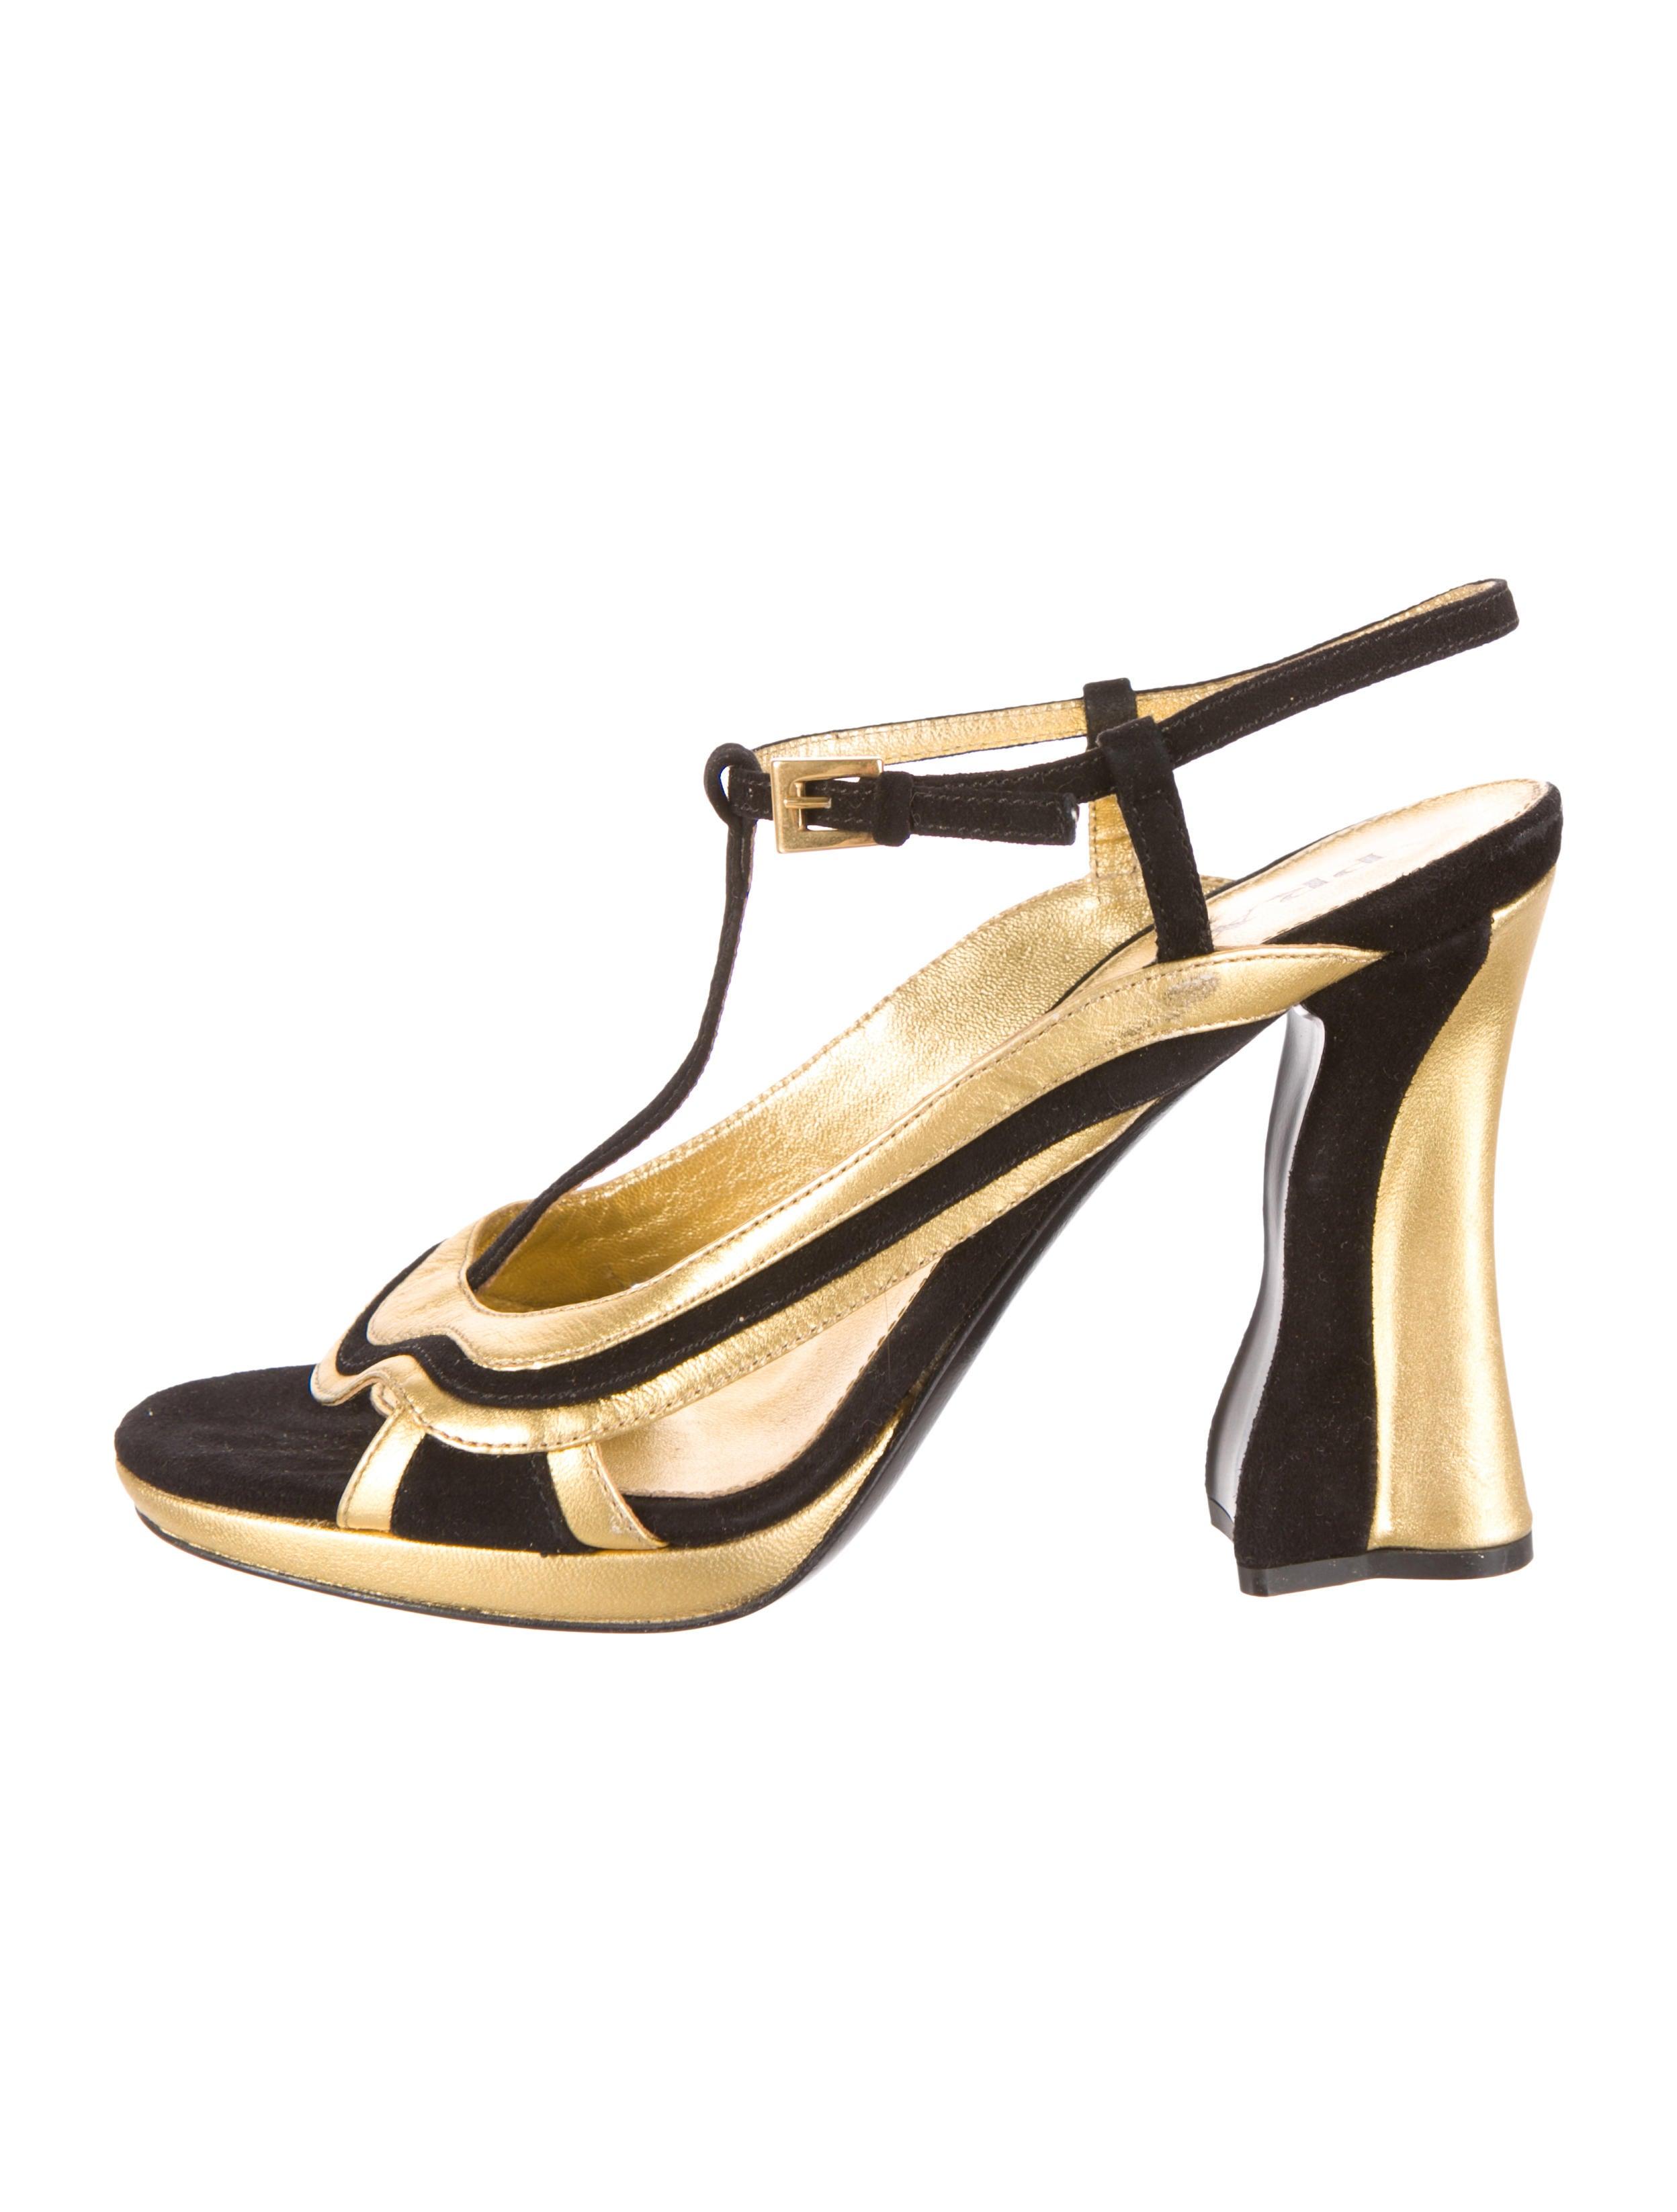 Perfect Prada Sandals  Shoes  PRA53673  The RealReal